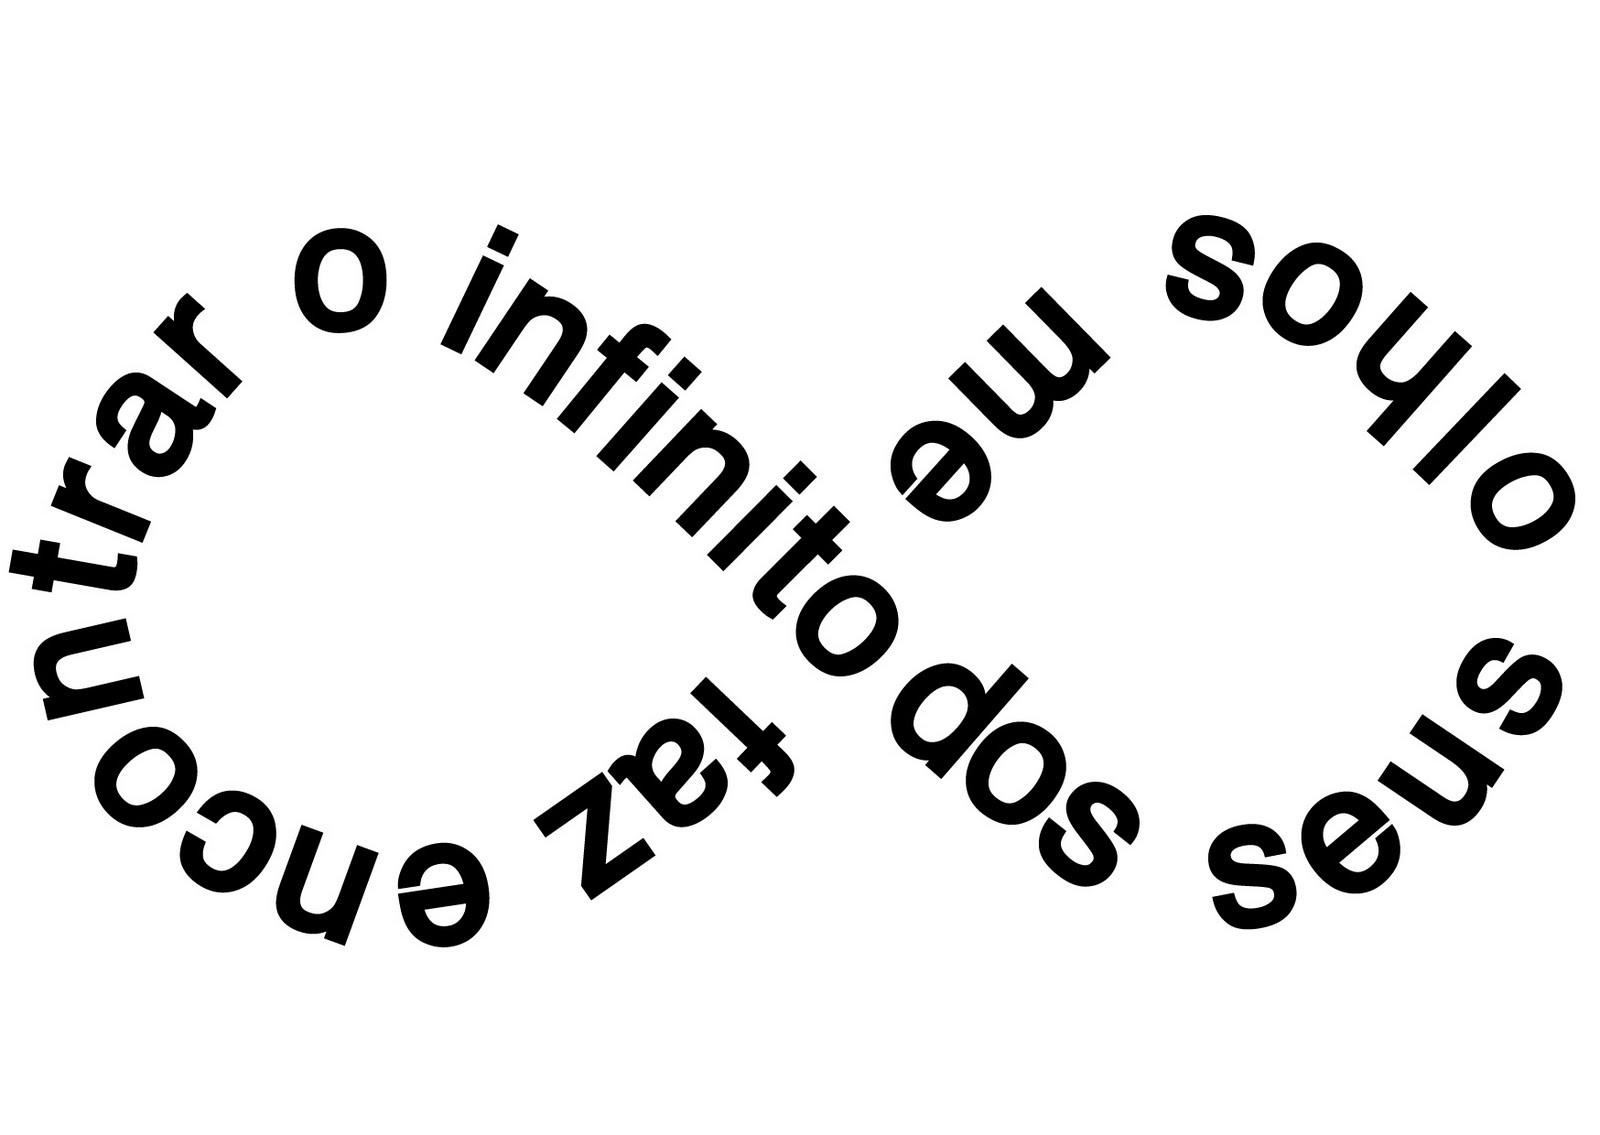 Poemas Vanguardistas :): Poemas Cubistas :)